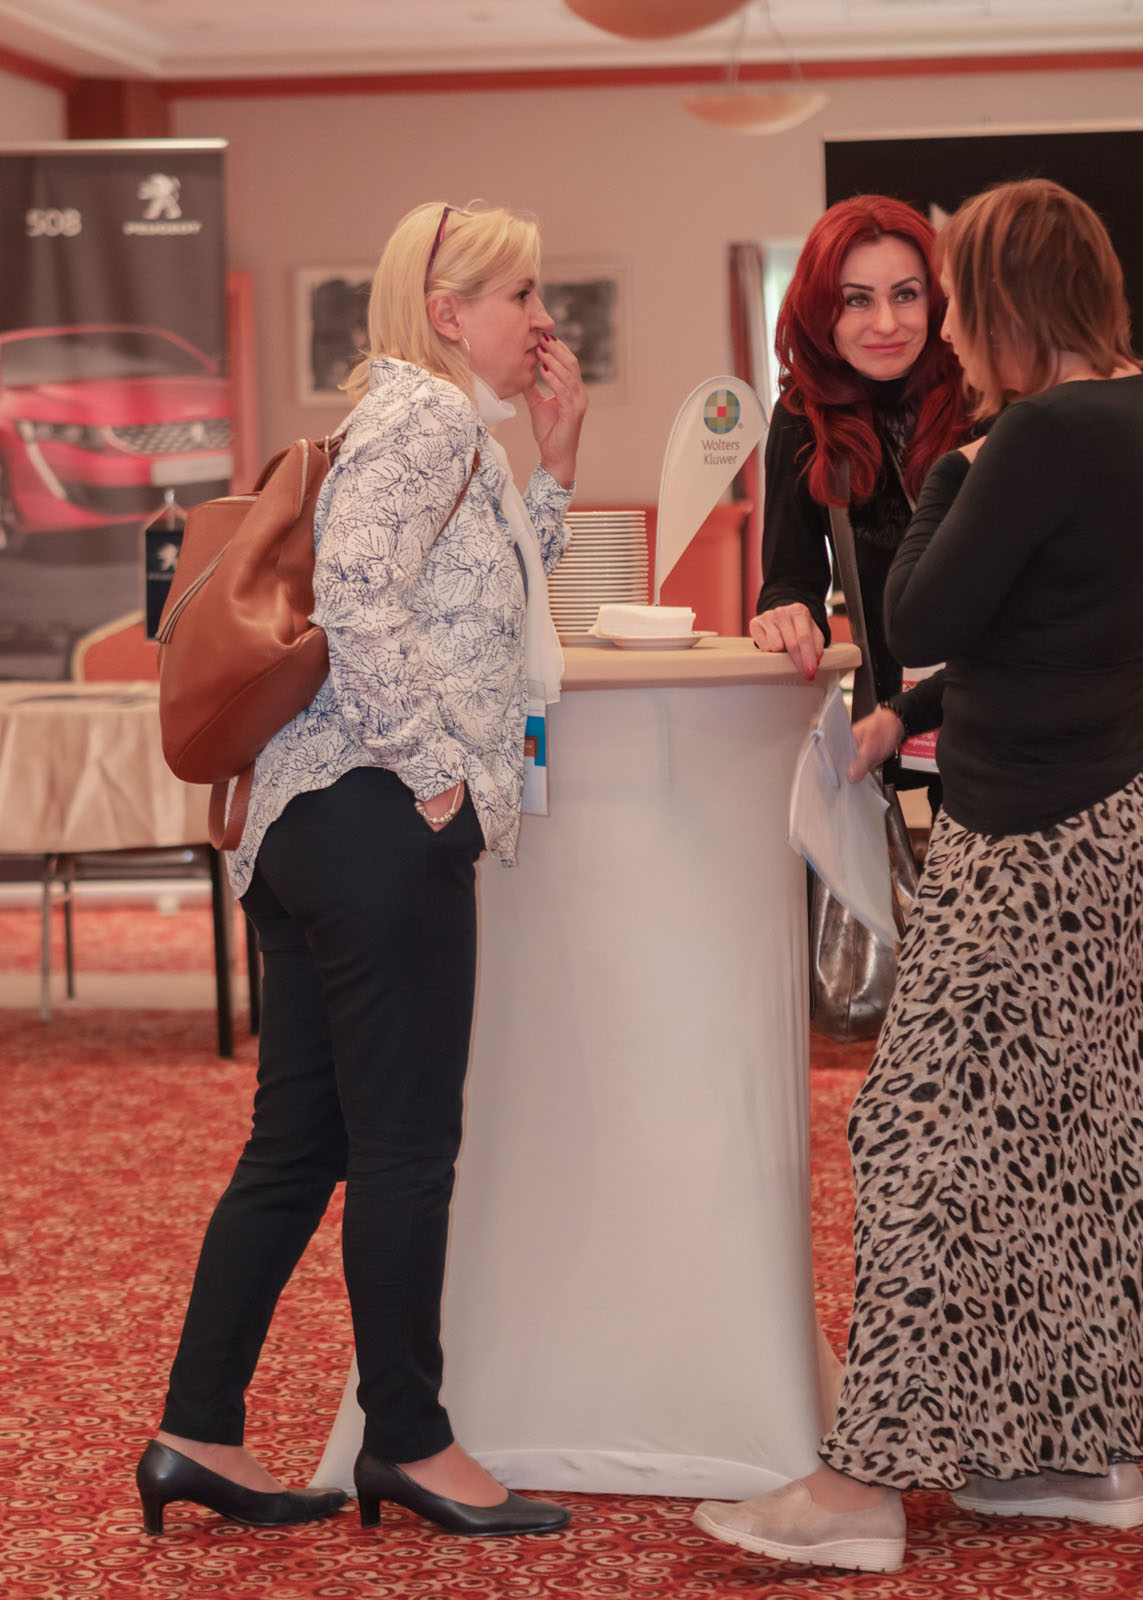 xvi-magyar-munkajogi-konferencia-kaveszunet